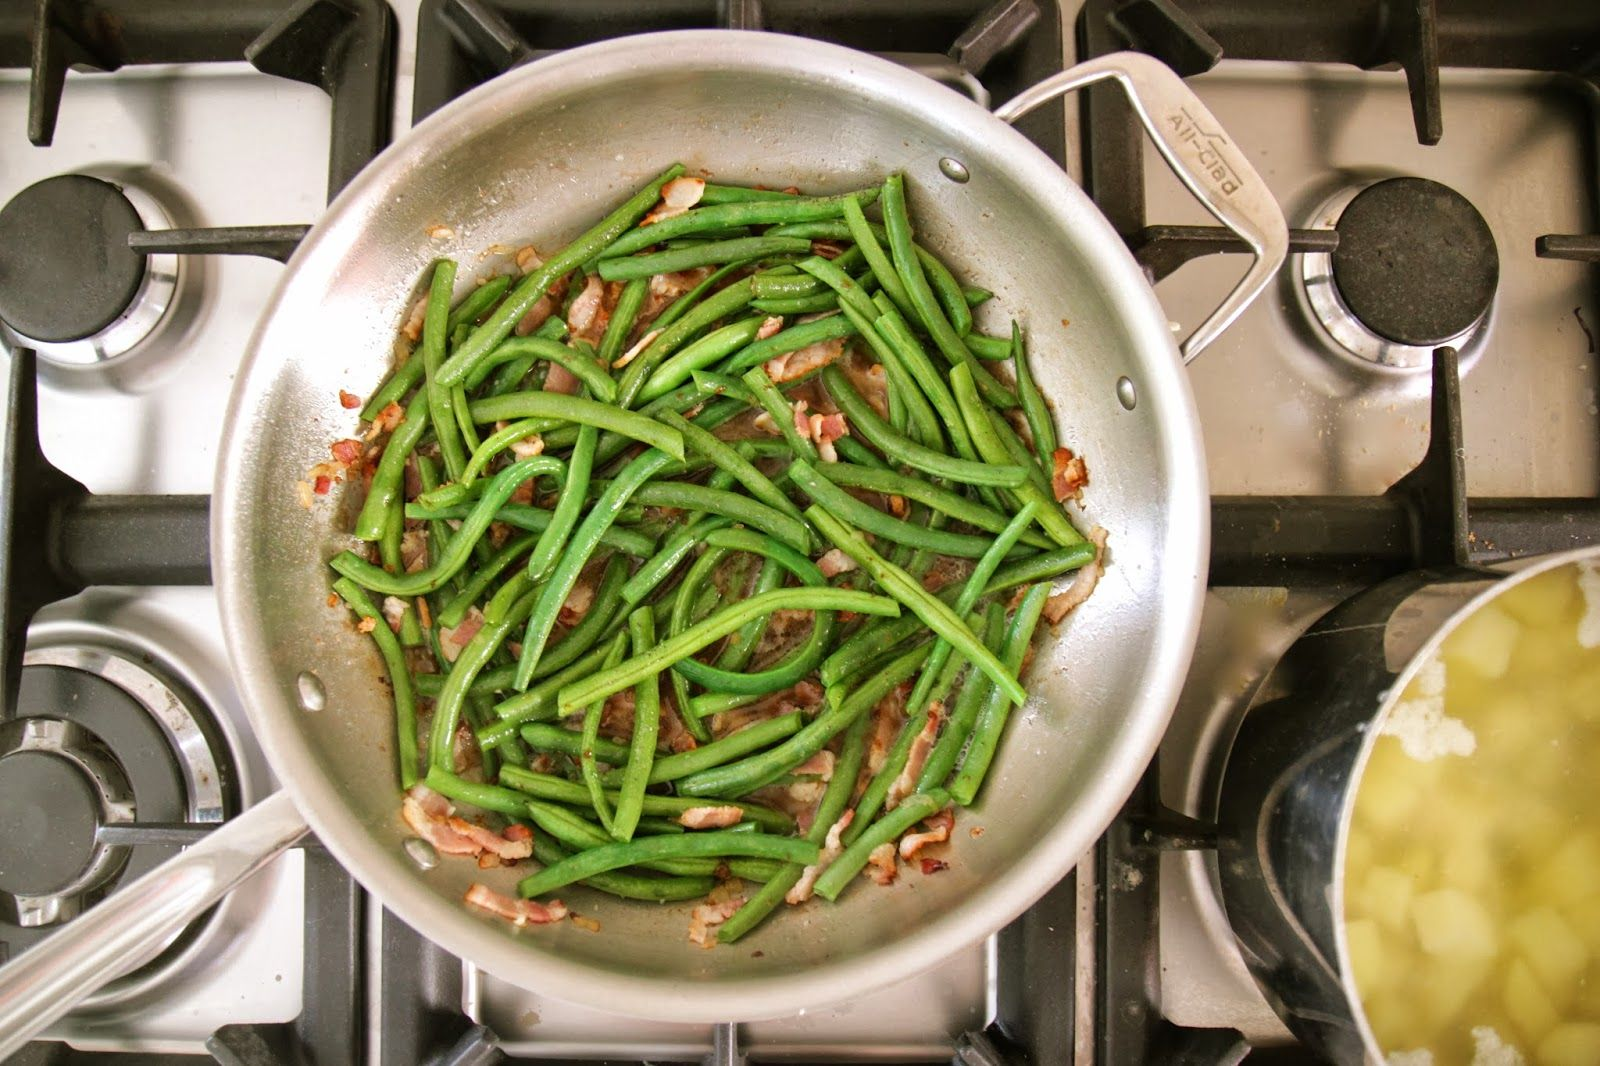 Jenny Steffens Hobick: Bacon Braised Green Beans